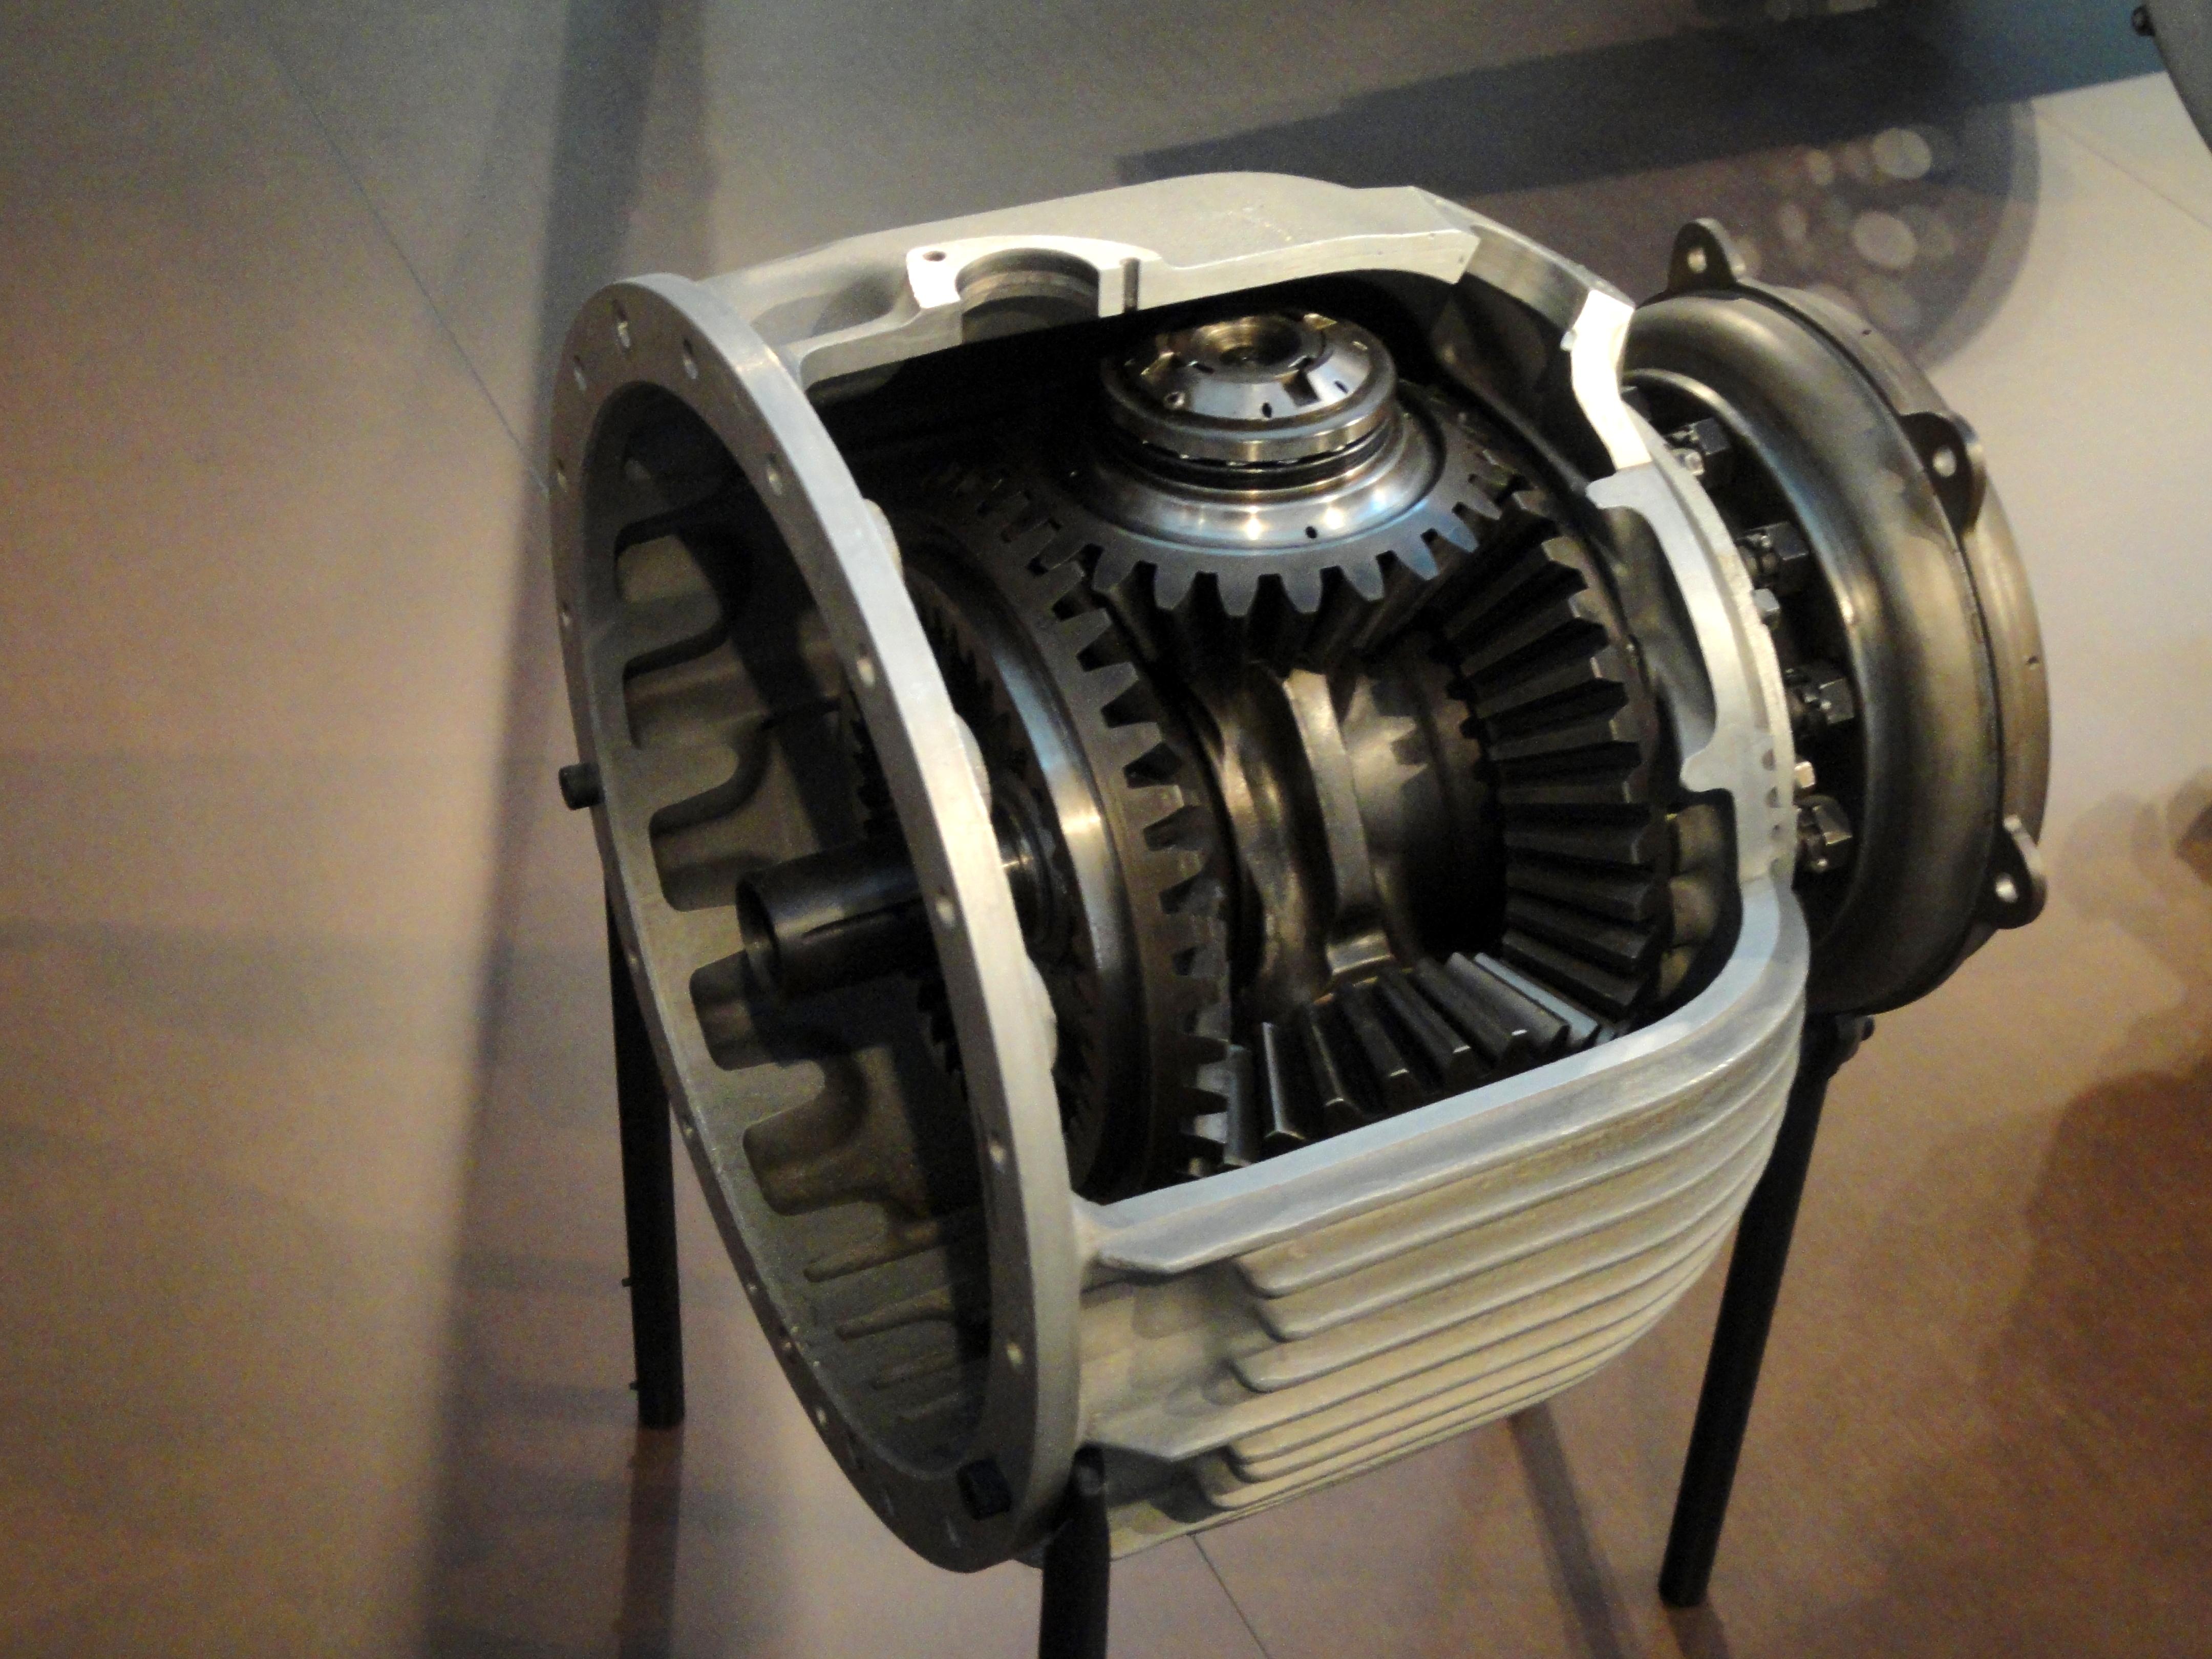 Mercedes Benz Museum >> File:Planetary gears, Maybach-Motors VL2 - Zeppelin Museum ...